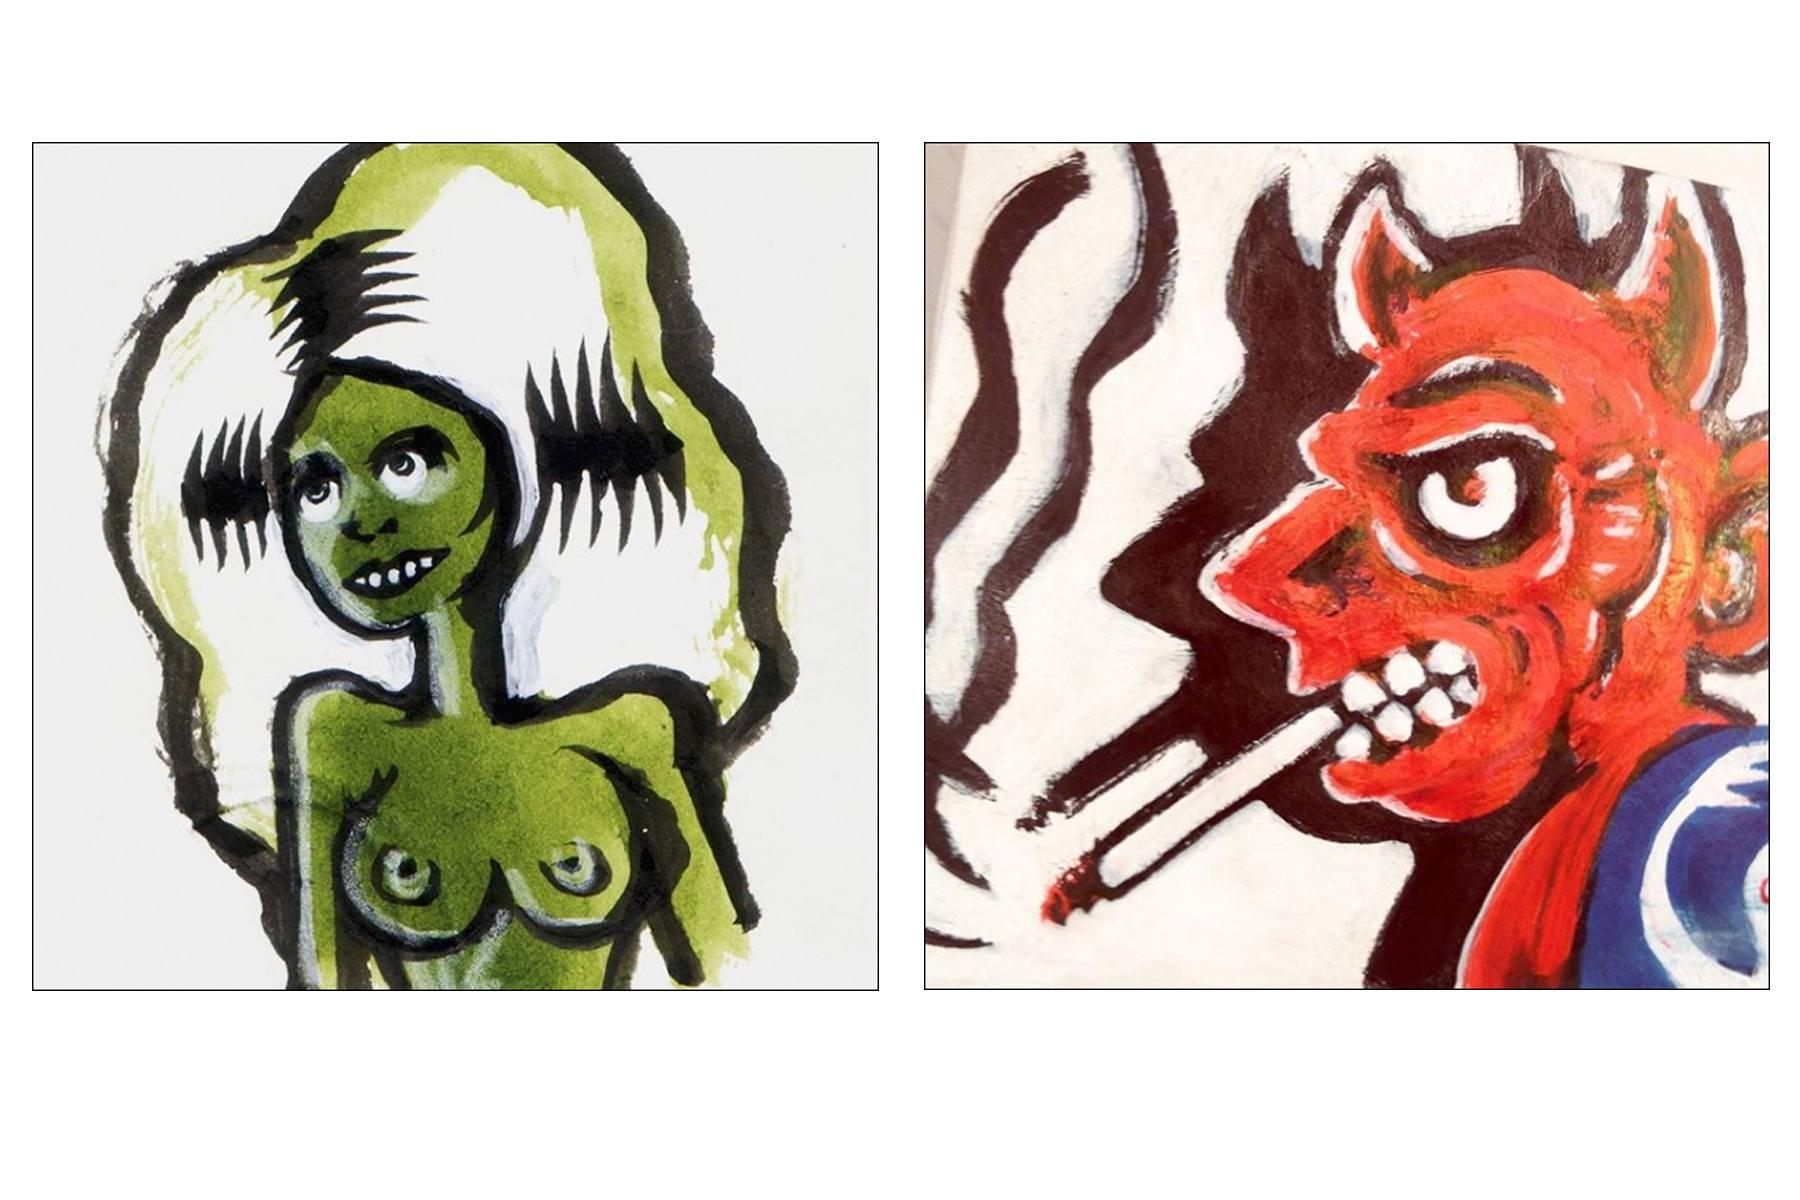 Creepy drawings by artist Avi Spivak. Ponyboy magazine.